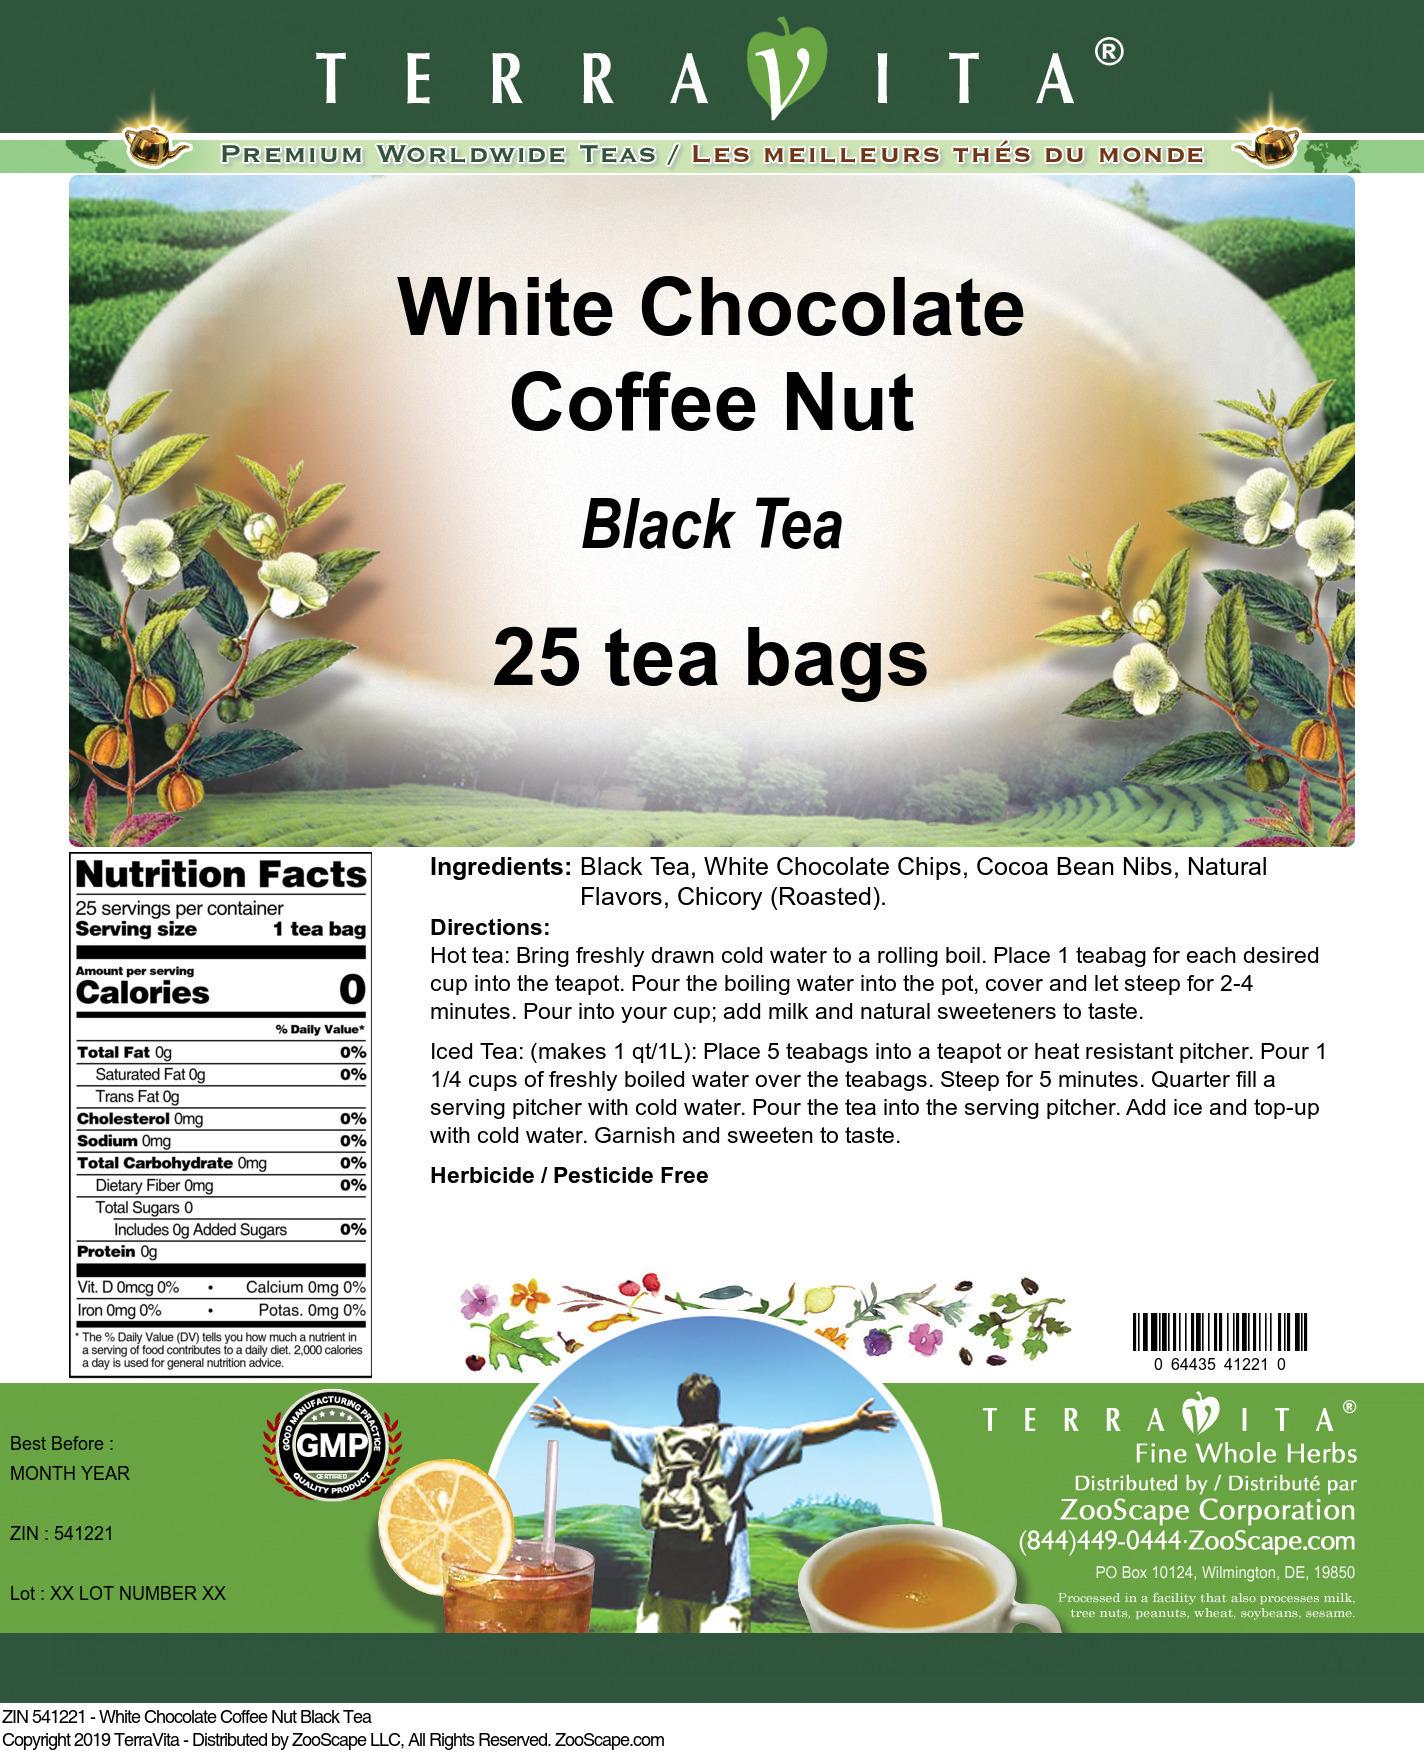 White Chocolate Coffee Nut Black Tea